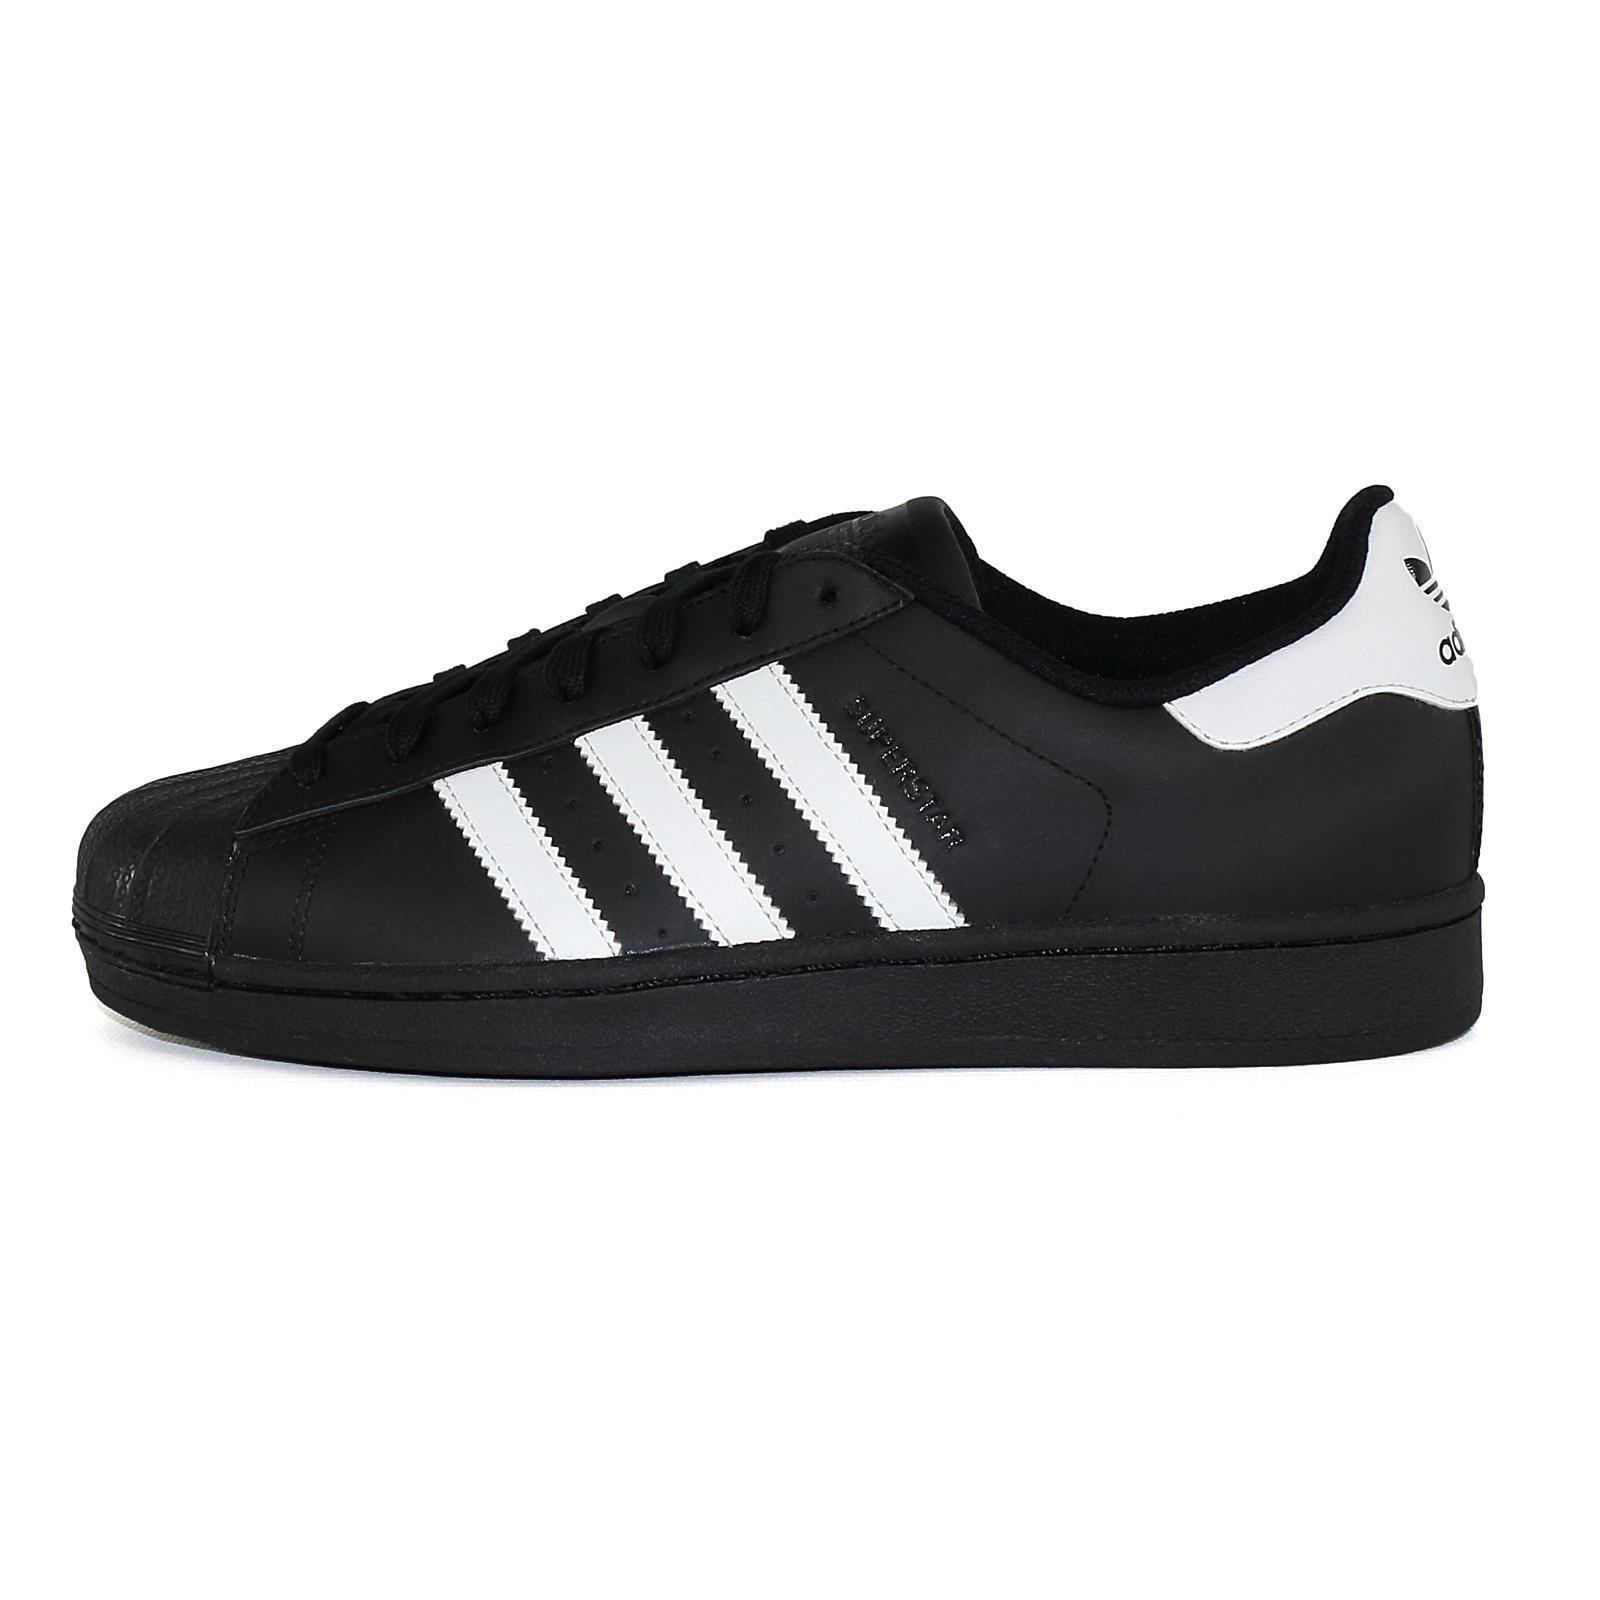 Adidas Superstar Foundatio Herren Schuhe Sneakers B27140 schwarz 50965